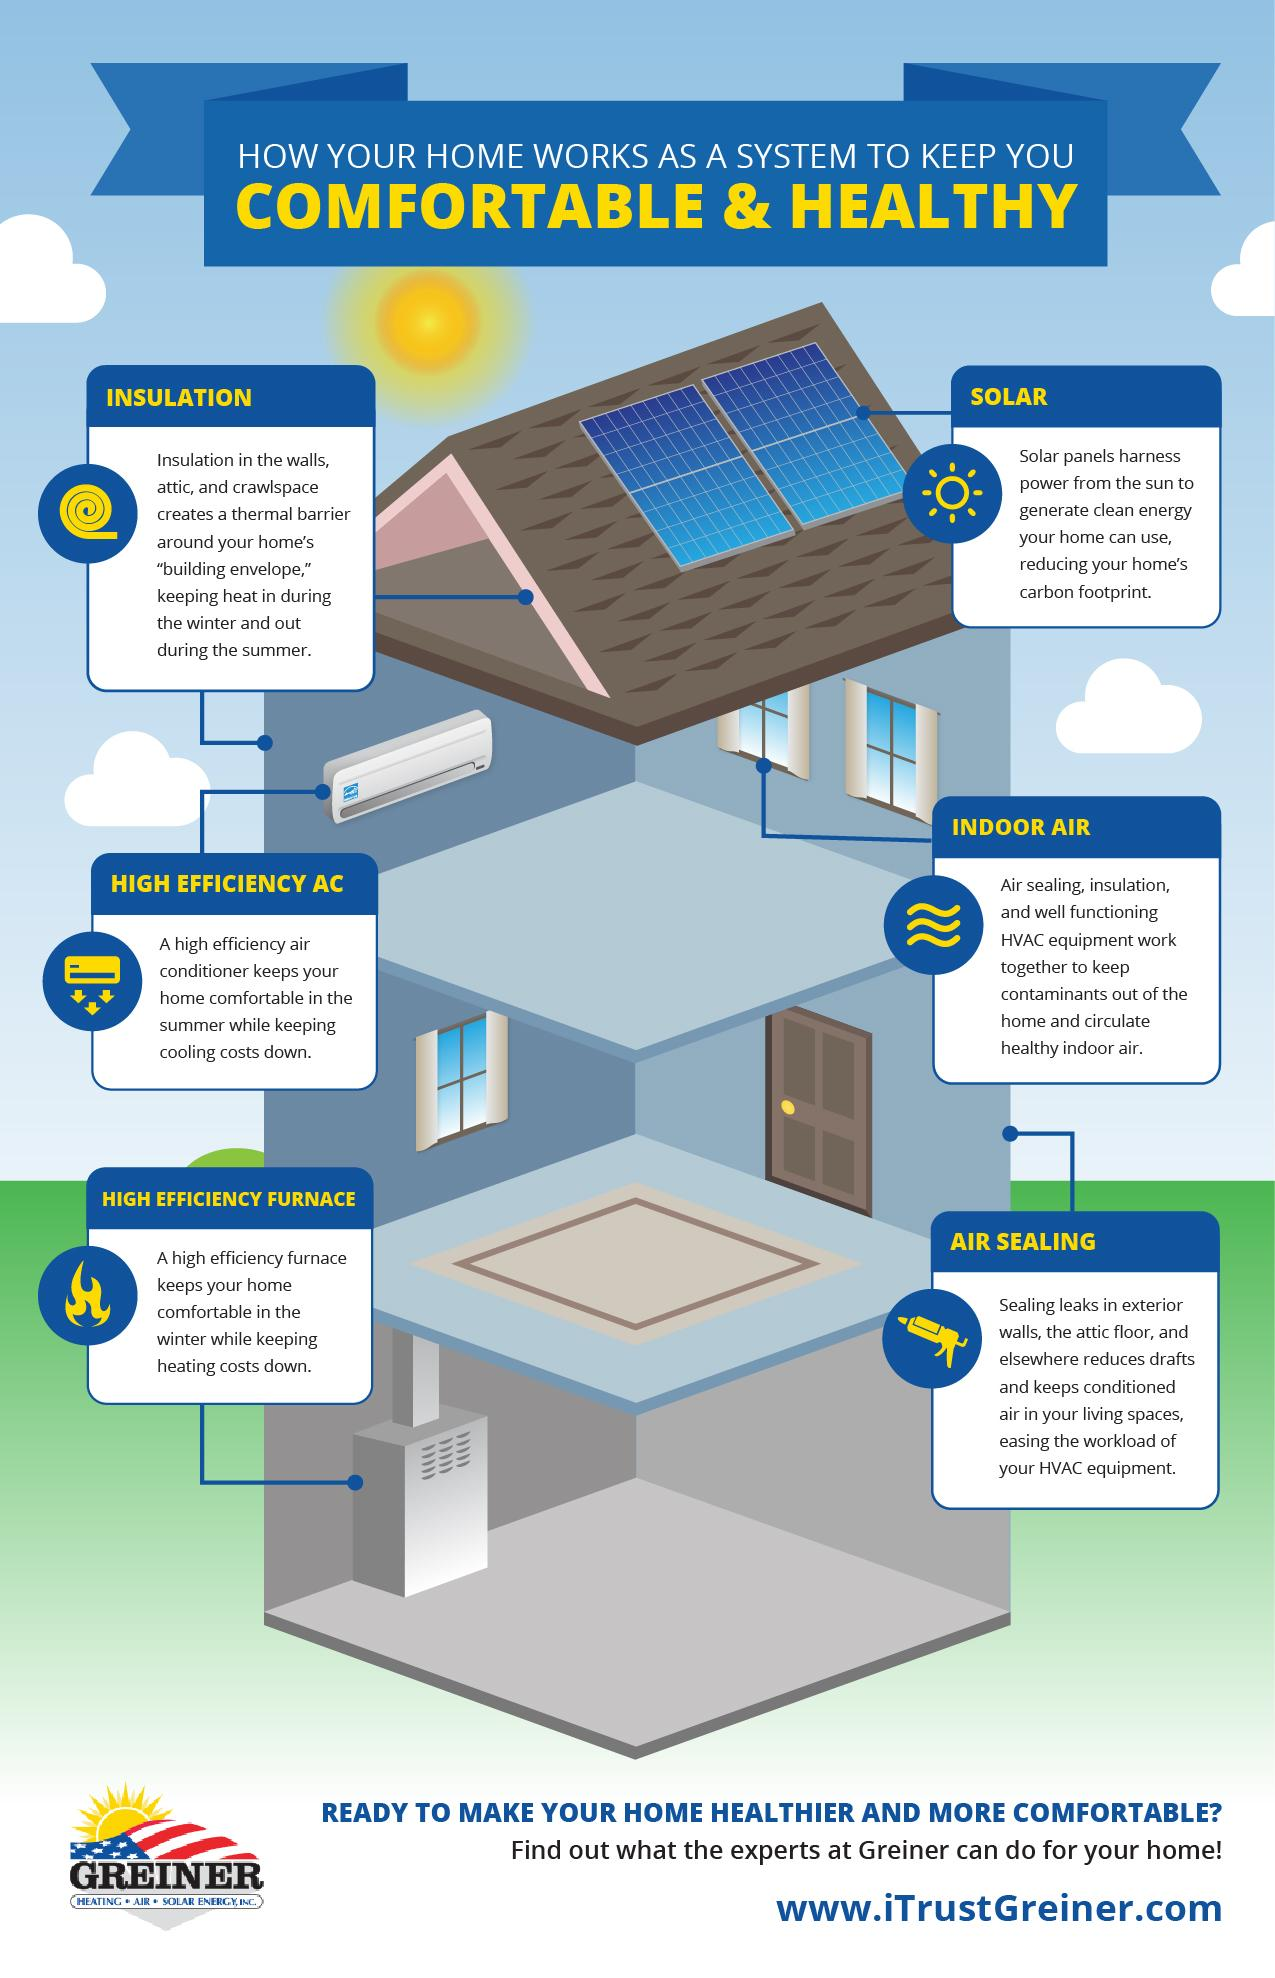 air sealing, insulation, furnace, ac, hvac, IAQ, solar, ghac, CA